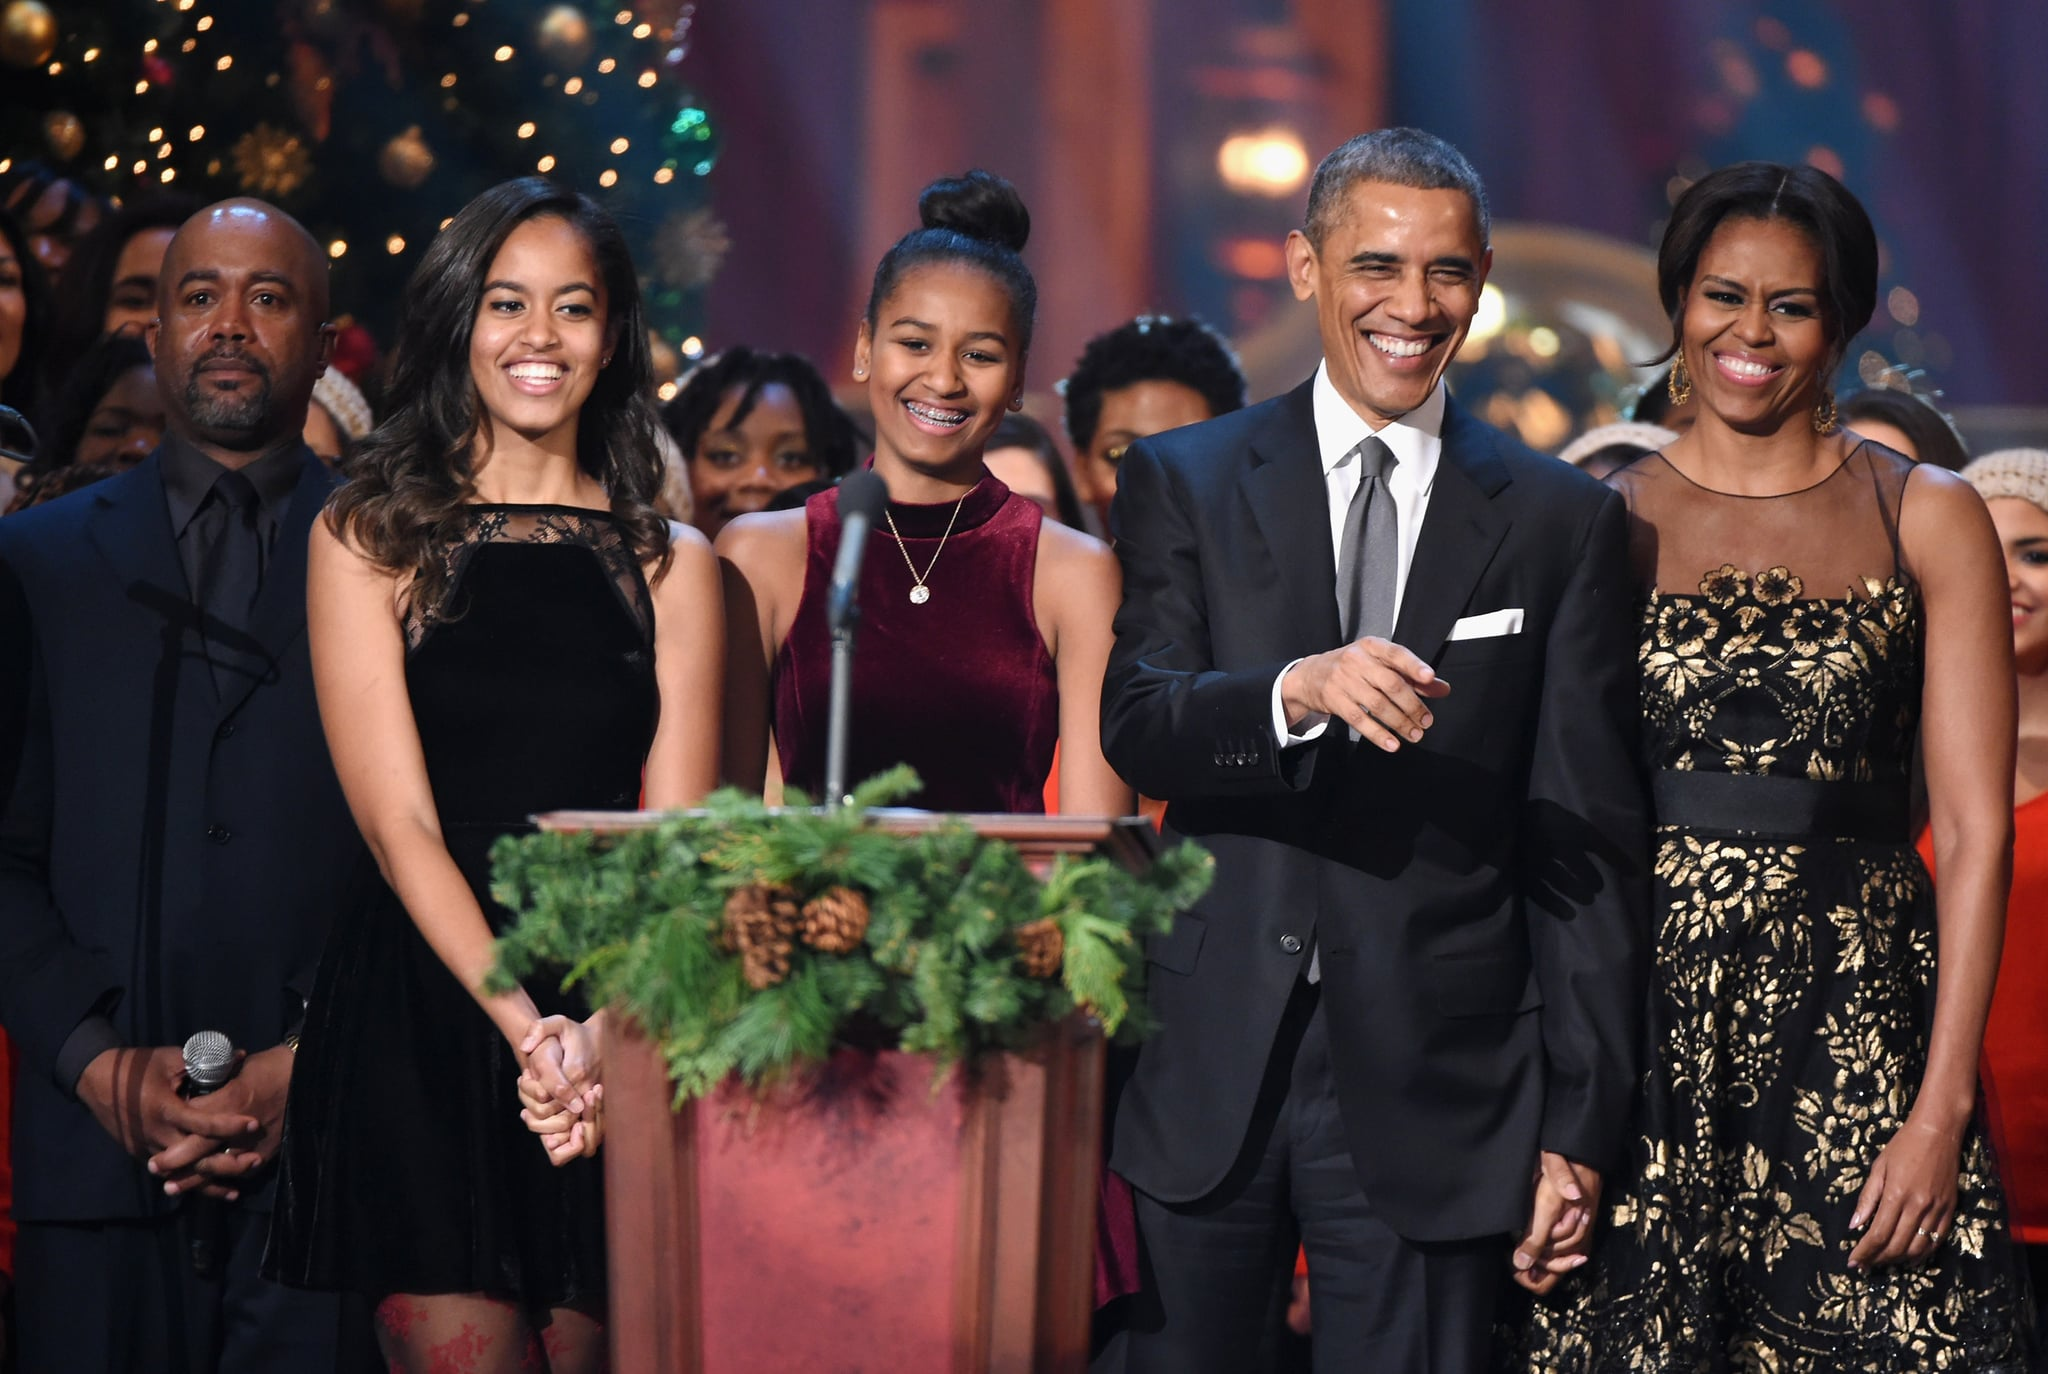 WASHINGTON, DC - DECEMBER 14:  (L-R) Darius Rucker, Malia Obama, Sasha Obama, U.S. President Barack Obama, and First Lady Michelle Obama speak onstage at TNT Christmas in Washington 2014 at the National Building Museum on December 14, 2014 in Washington, DC.  25248_001_0605.JPG  (Photo by Theo Wargo/WireImage)